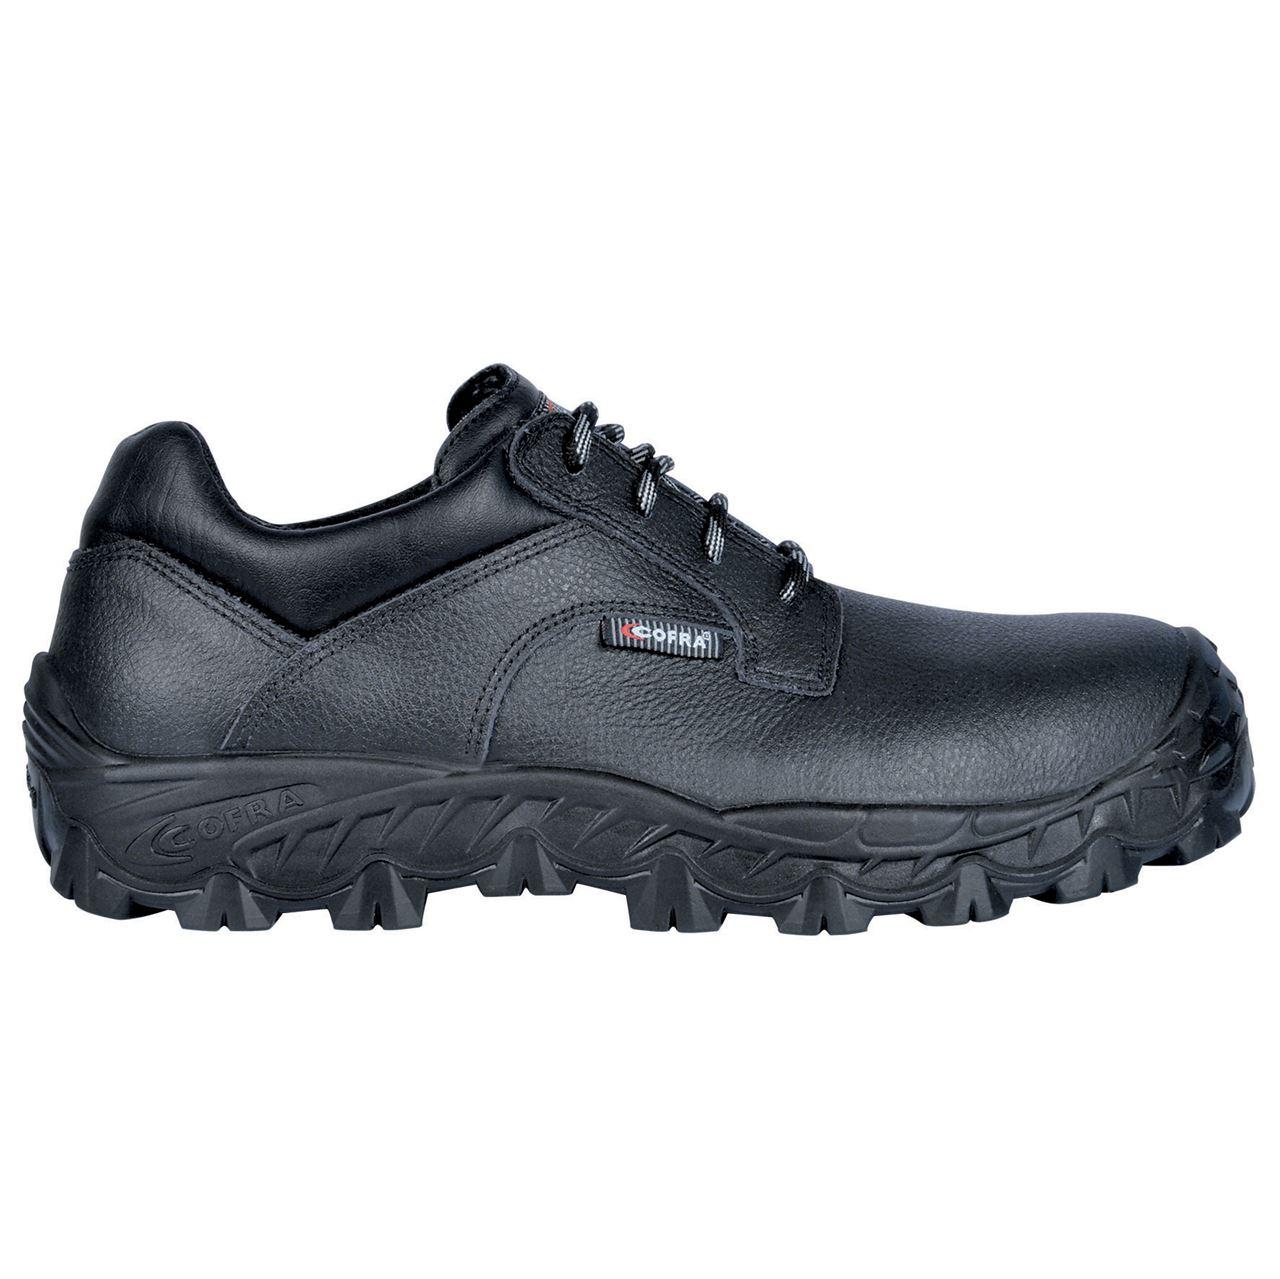 efe3f13ae15 Cofra Bismarck Unisex Non-Metallic Antistatic S3 Safety Shoe